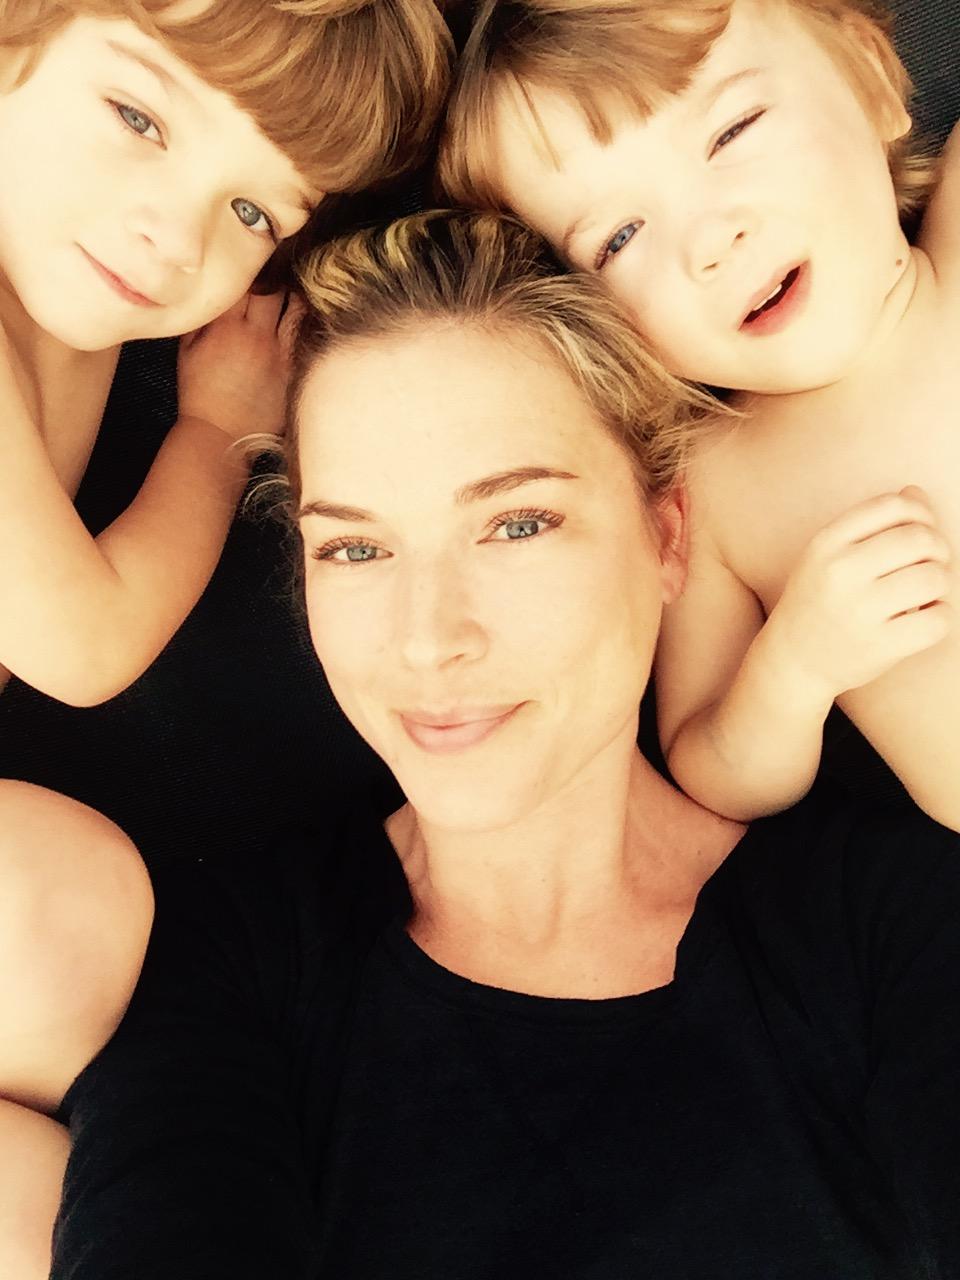 Designer Reagan Rowland with her twins Weston & Lane